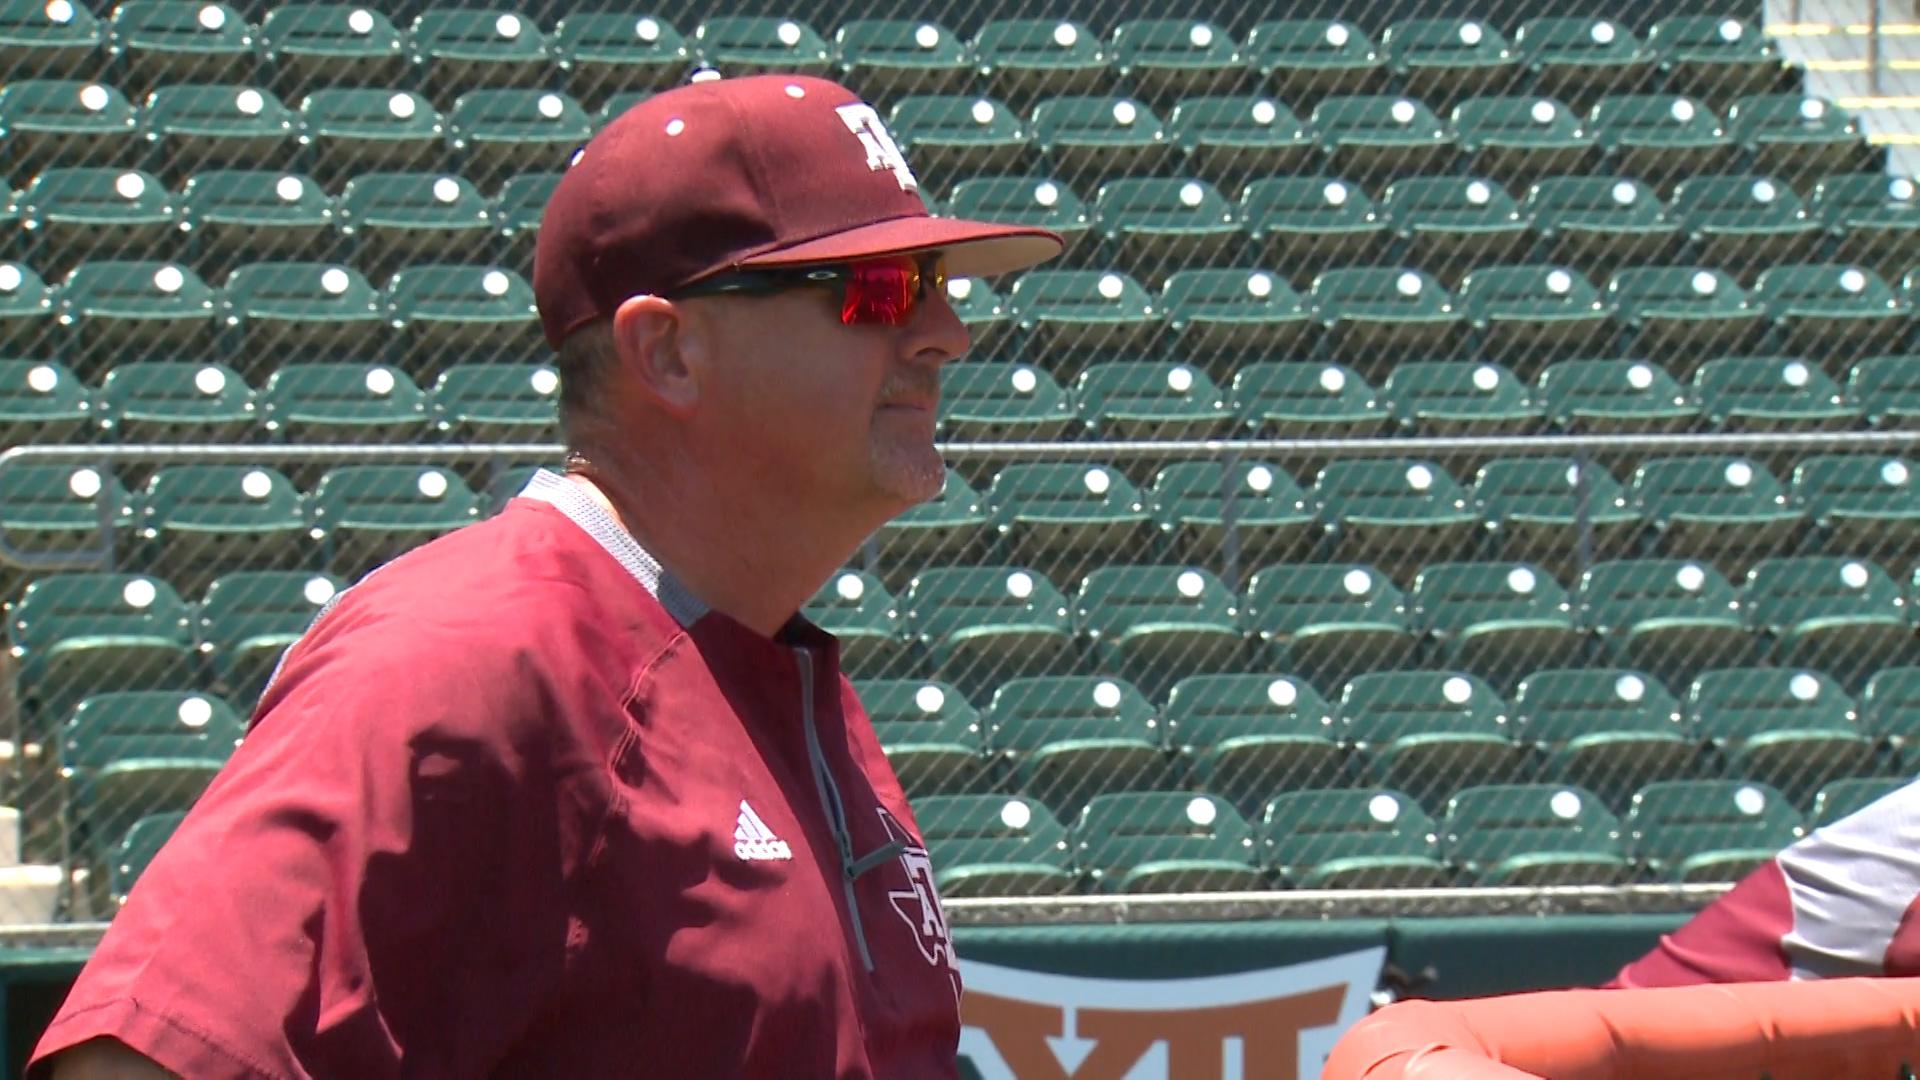 Rob Childress Texas A&M Baseball_1527820955836.jpg.jpg